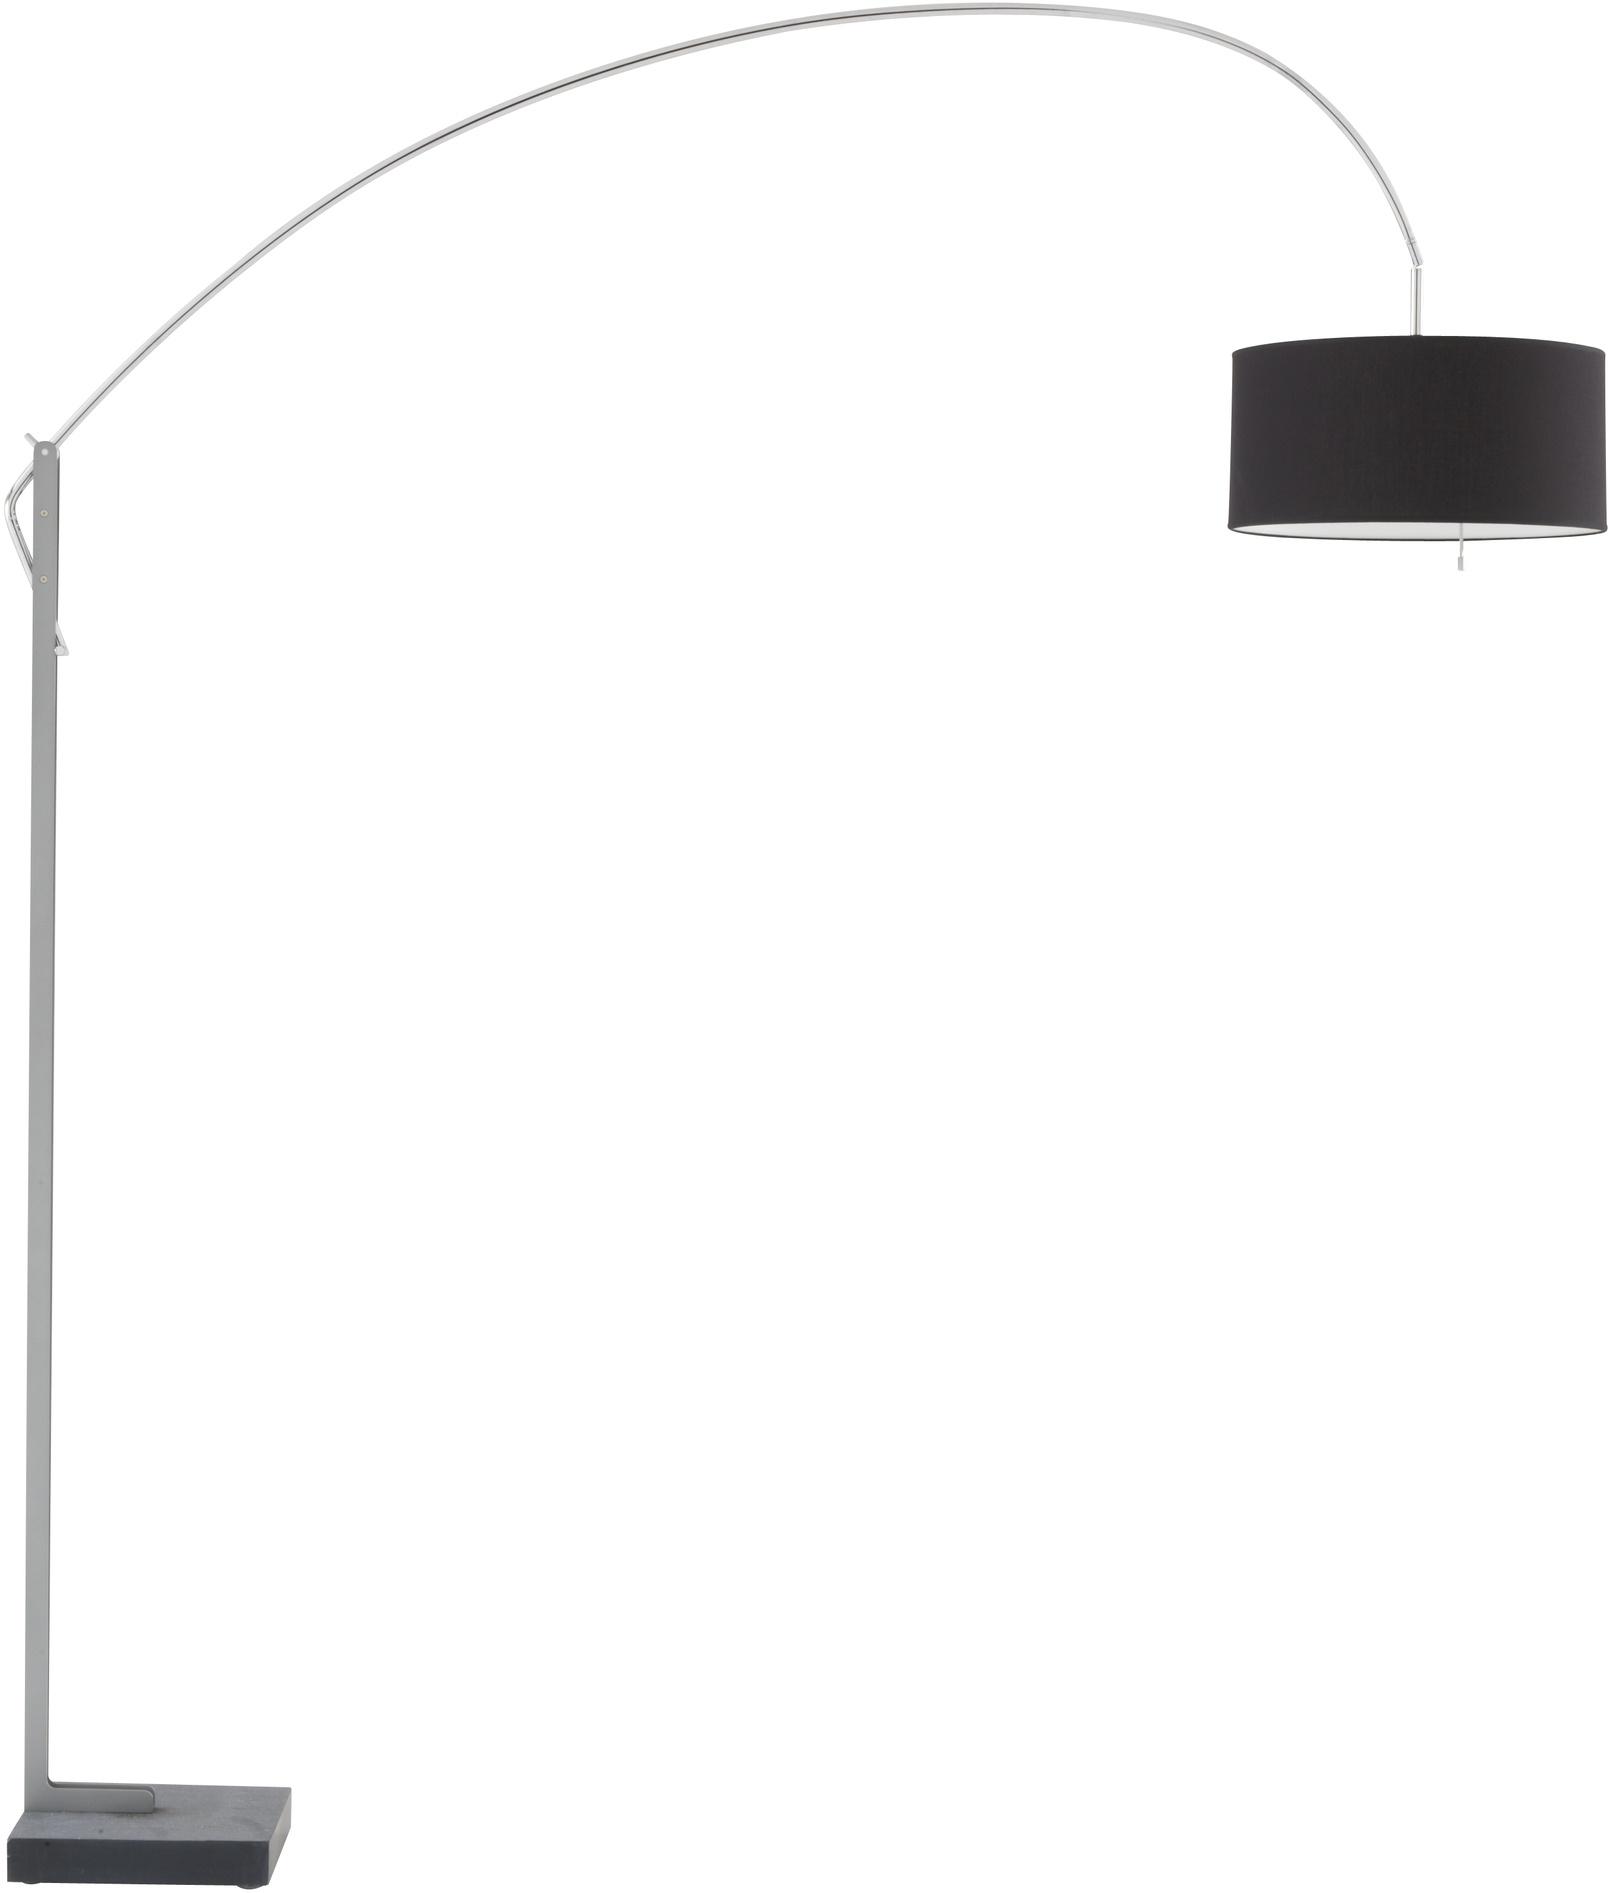 mama lampadaires designer thibault desombre ligne roset. Black Bedroom Furniture Sets. Home Design Ideas